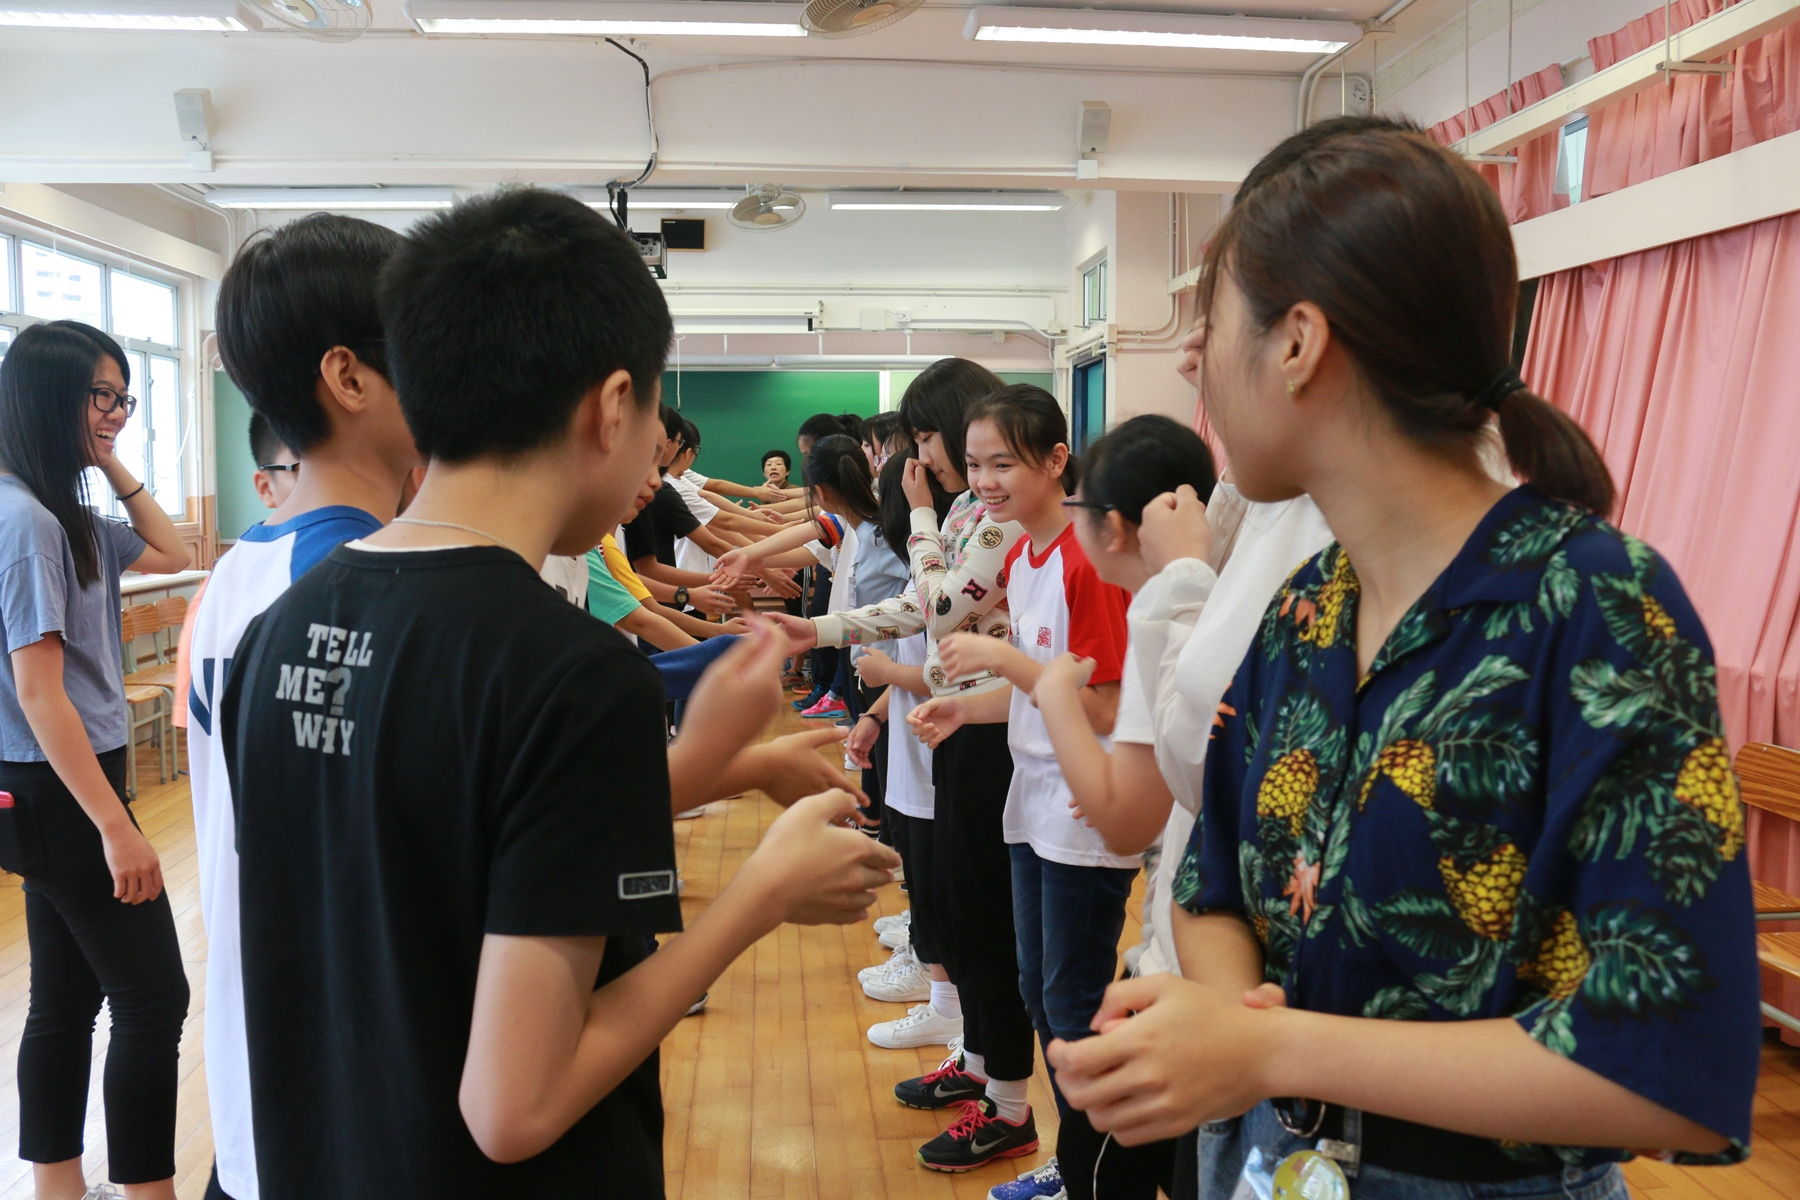 http://npc.edu.hk/sites/default/files/1a_zhong_zhi_cheng_cheng_01.jpg